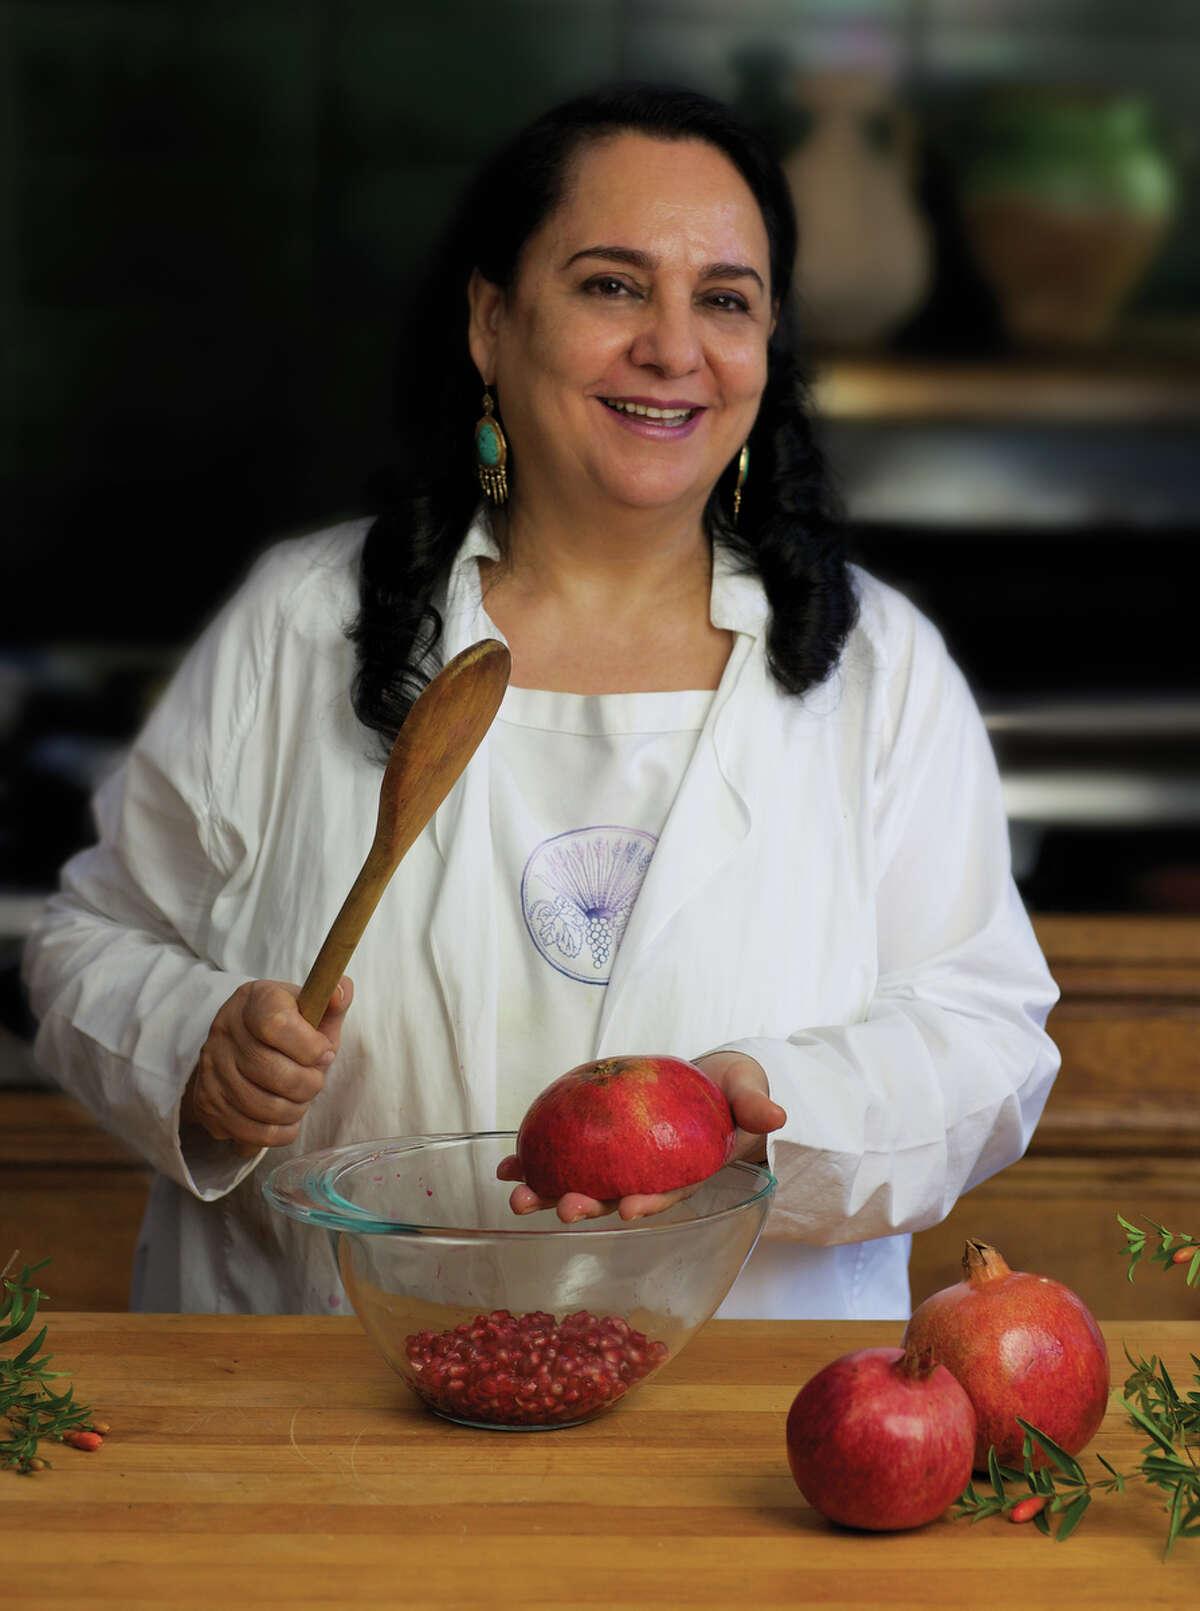 Cookbook author Najmieh Batmanglij, called